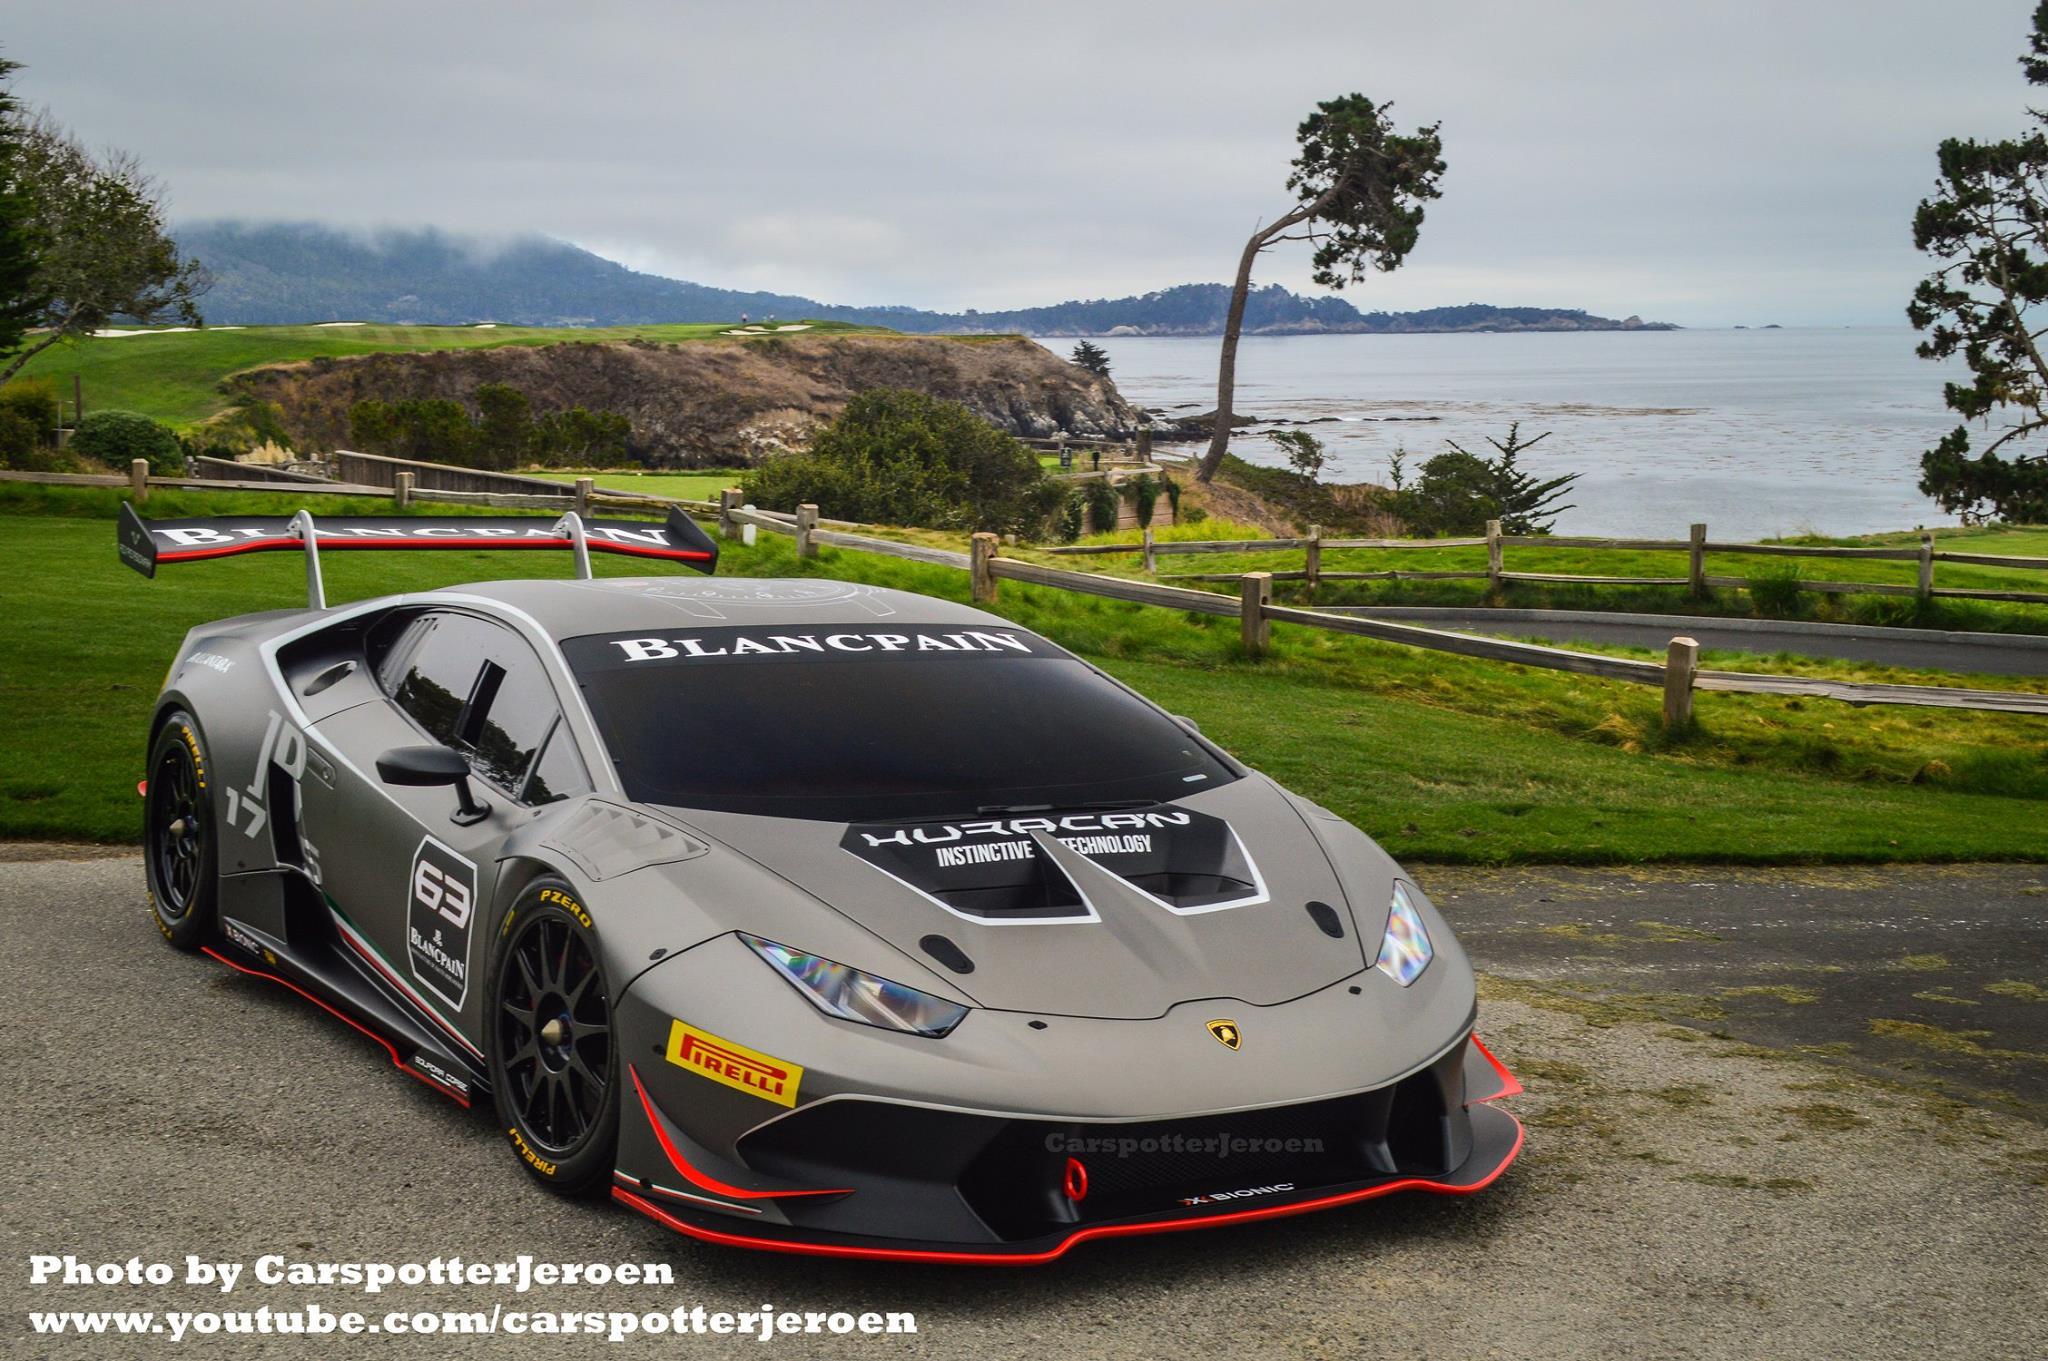 Foto Mobil Balap Lamborghini Kawan Modifikasi